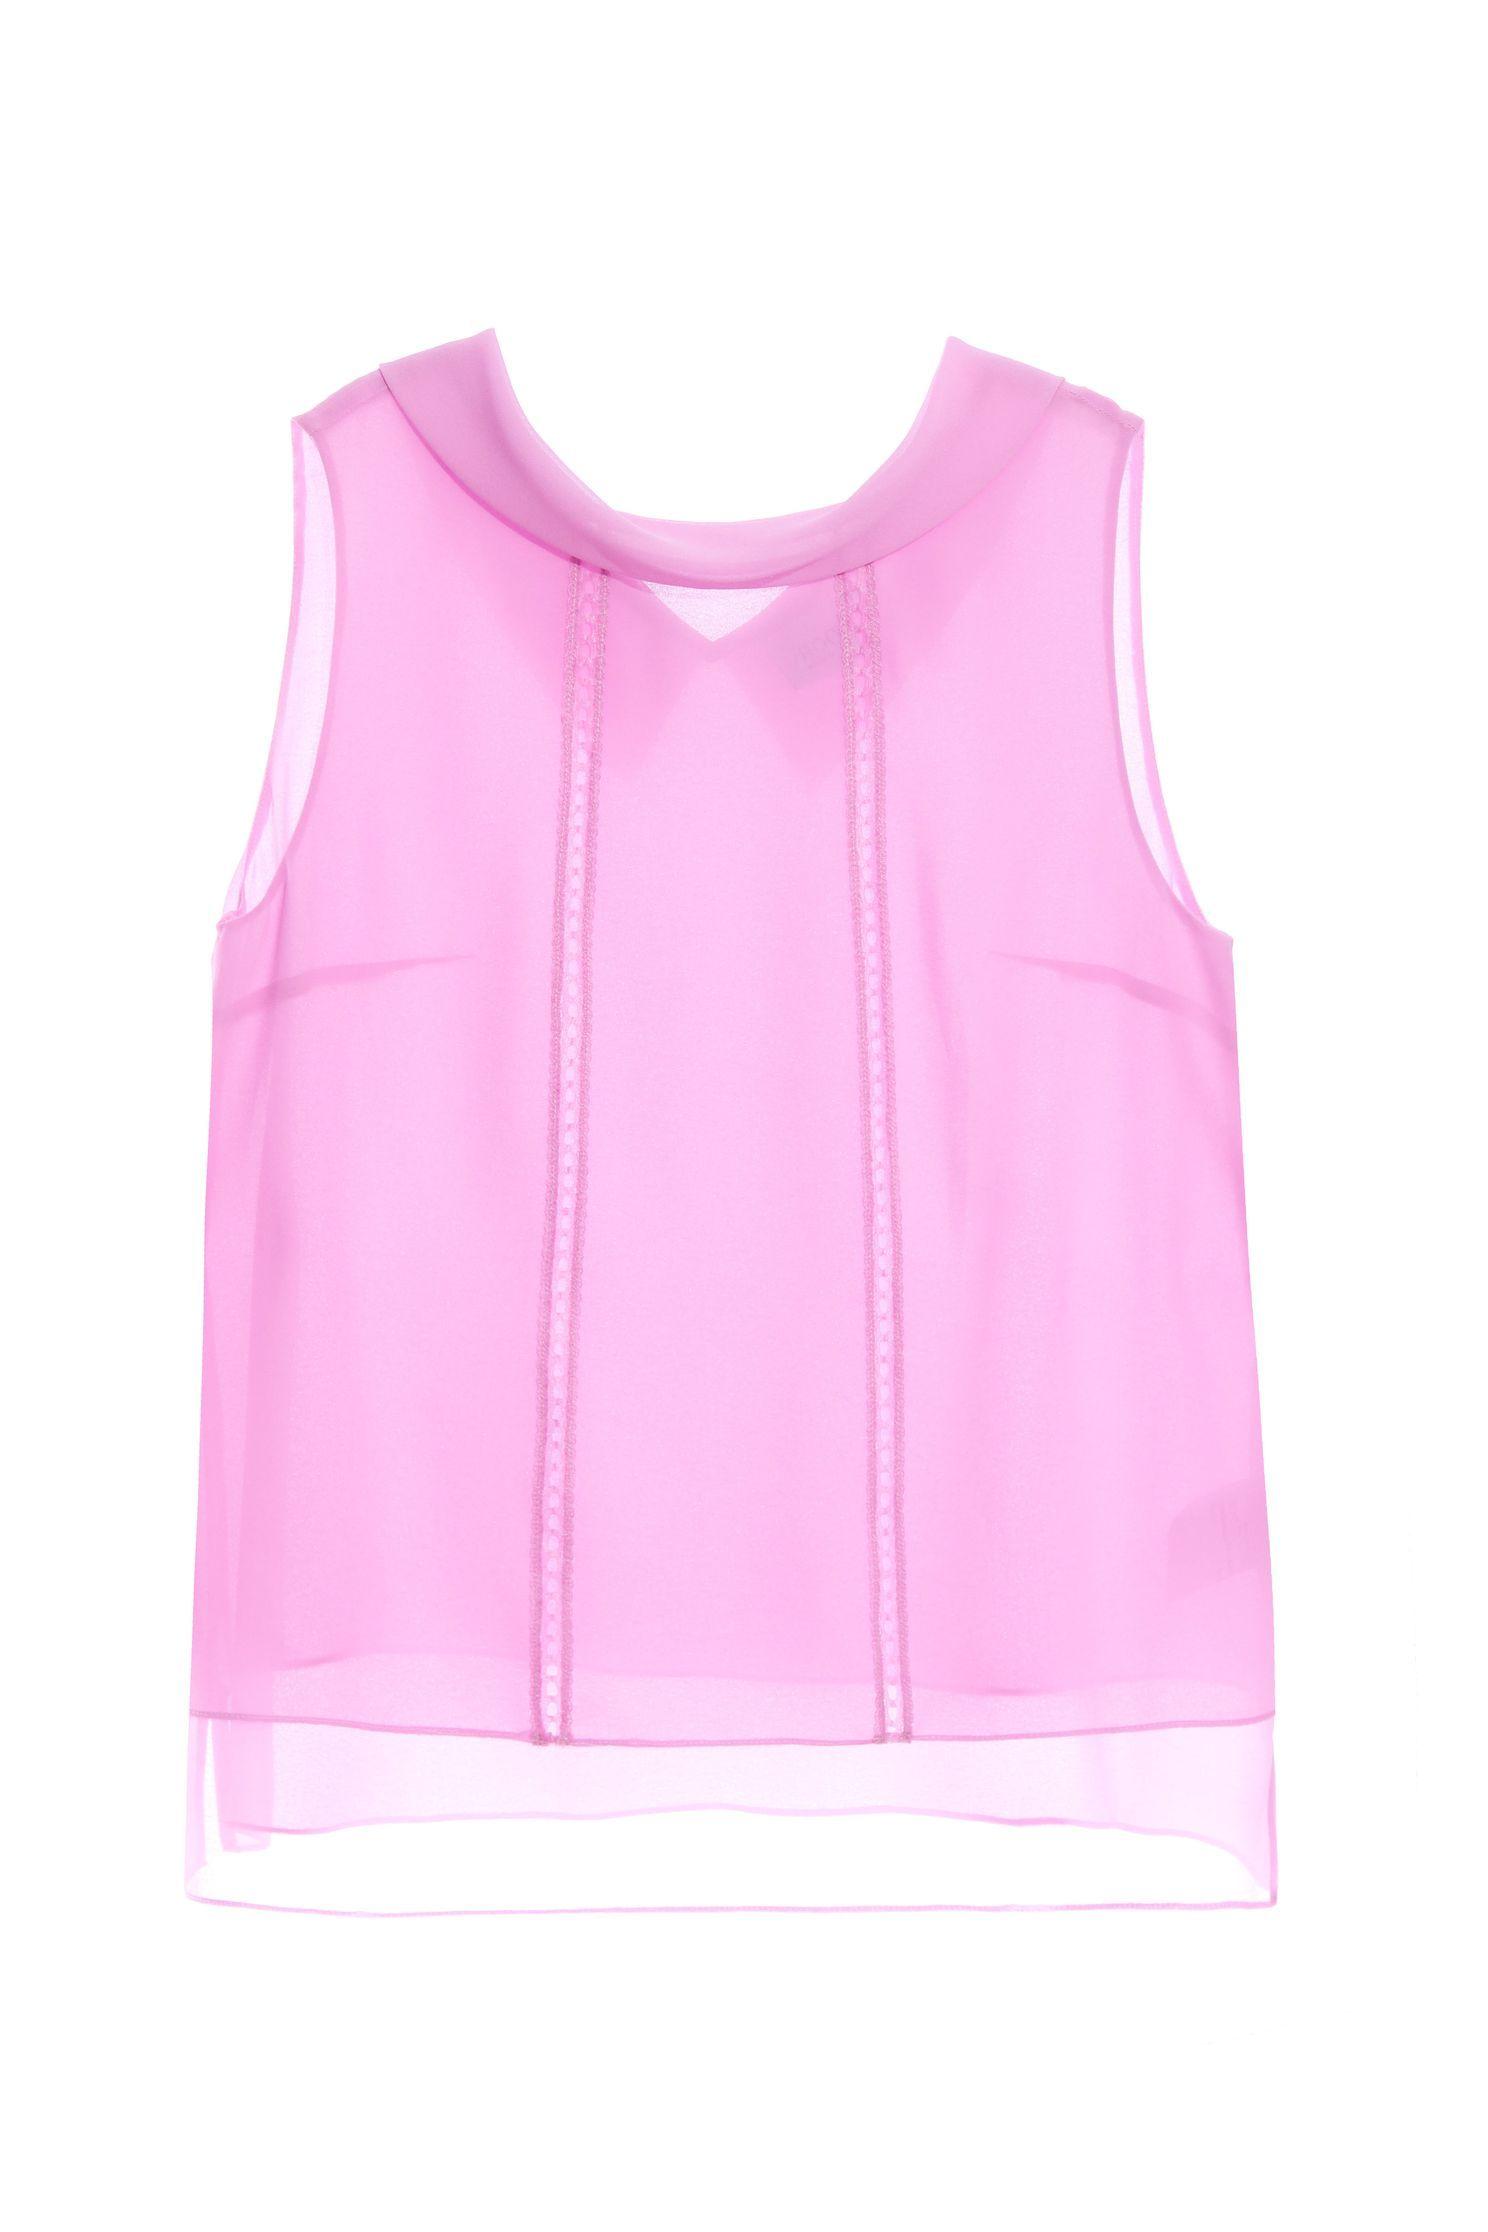 Reverse neckline chiffon top,sleeveless tops,Tops,Season (SS) Look,sleeveless tops,Valentine,sleeveless tops,Lace,Chiffon,Chiffon tops